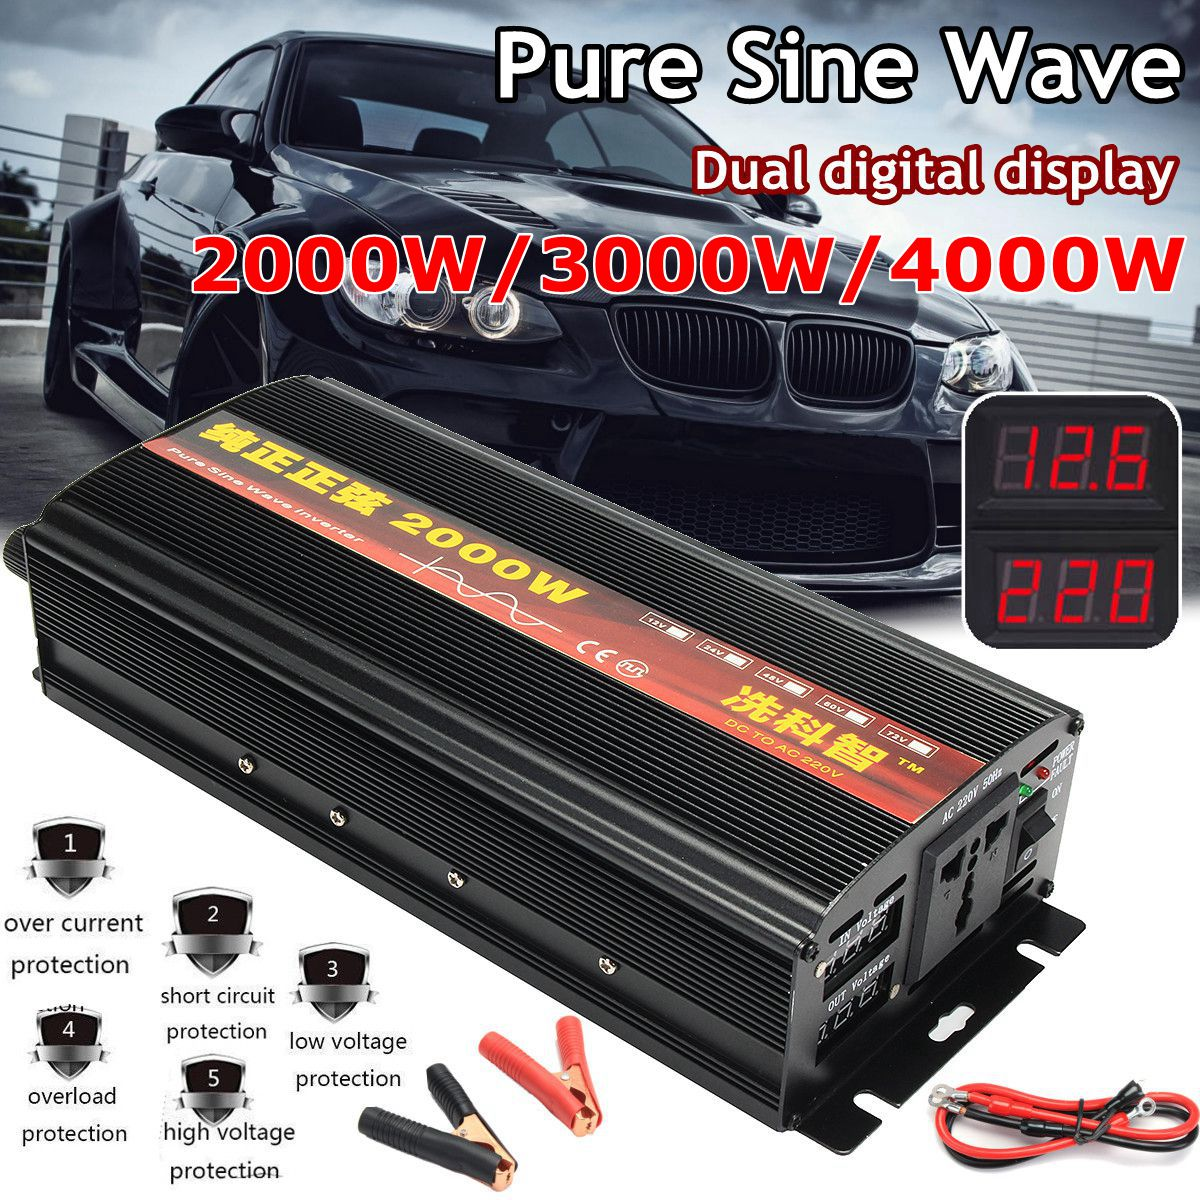 Onduleur 12 V/24 V 220 V 2000/3000/4000 W transformateur de tension pur onduleur à onde sinusoïdale DC12V à AC 220 V convertisseur + 2 LED affichage